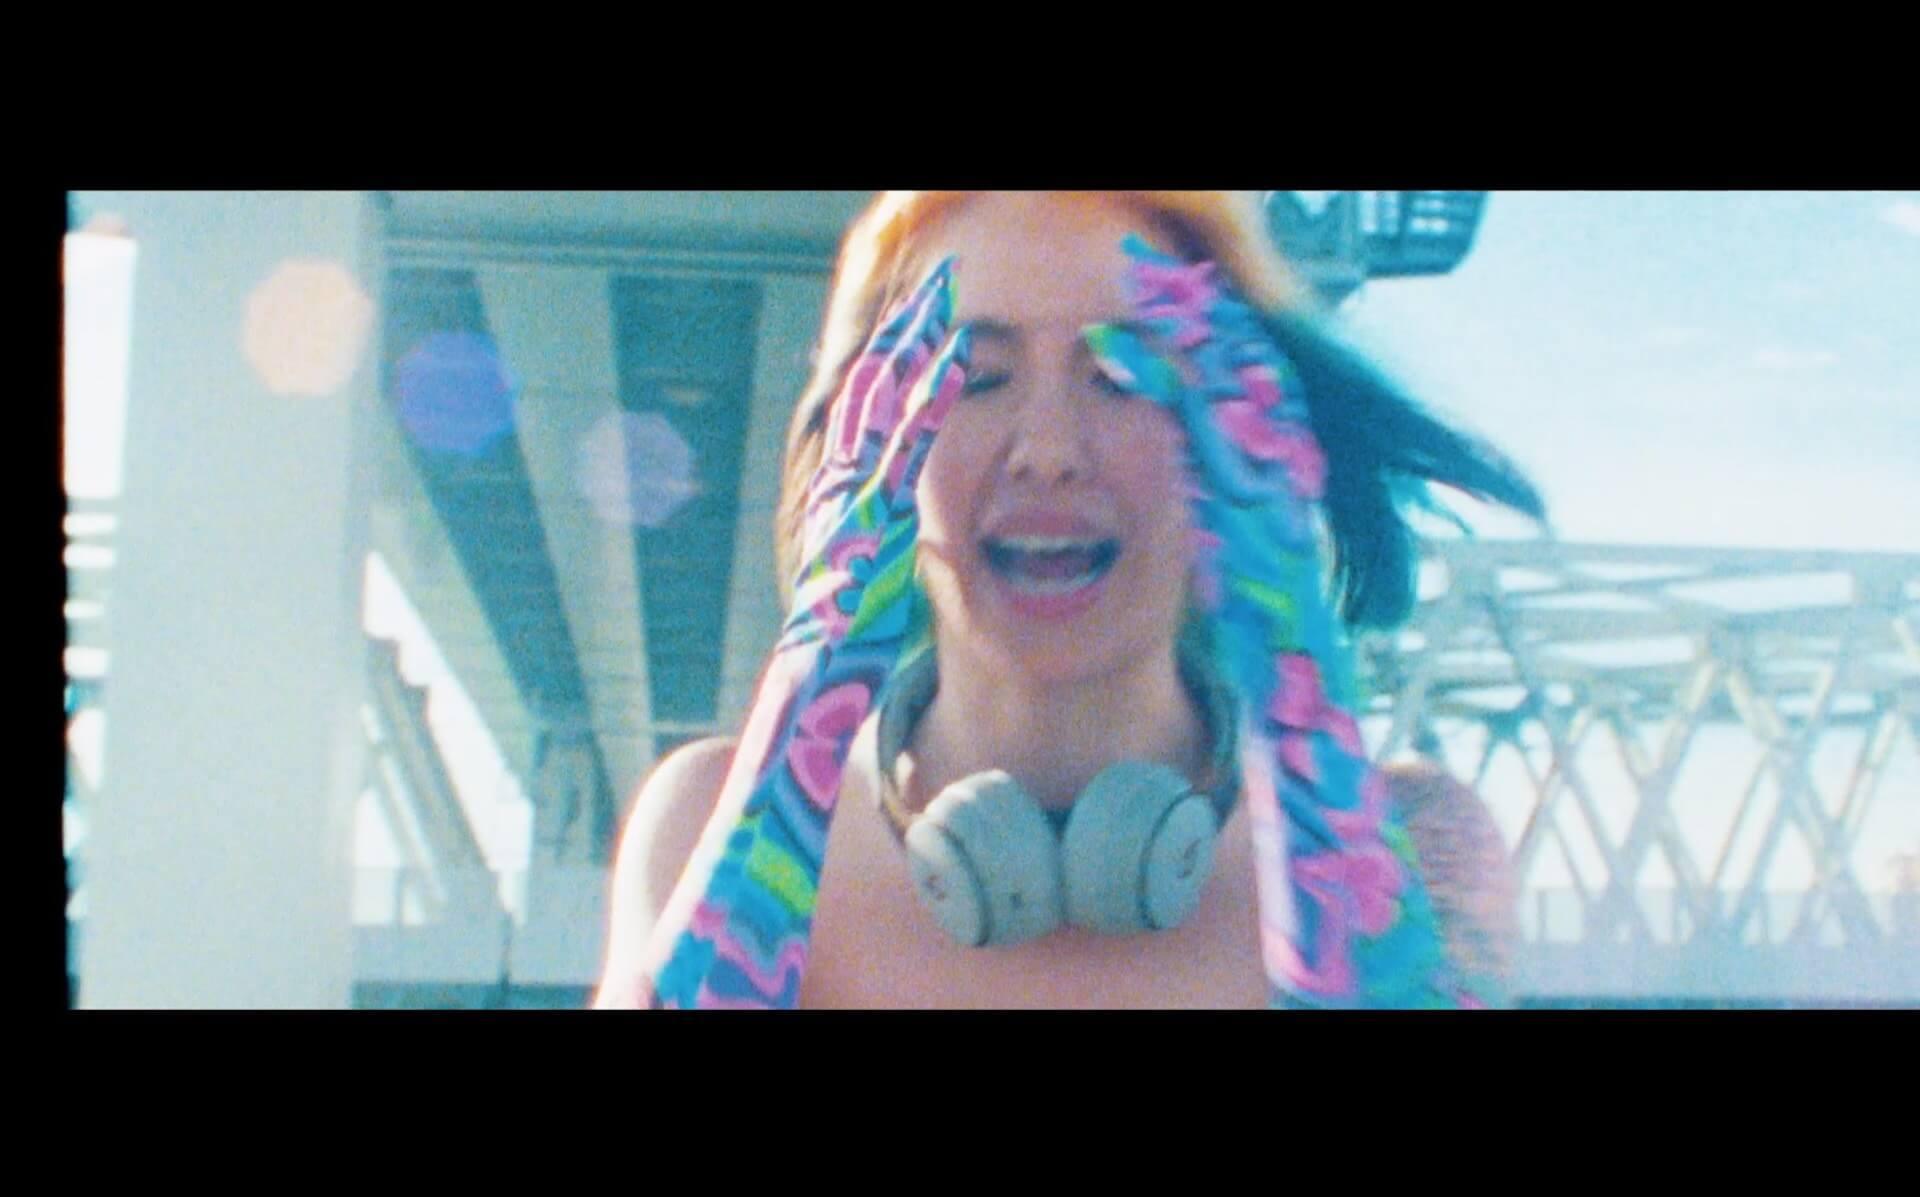 "NENEの最新EP『夢太郎』&ゆるふわギャング, ヘンタイカメラ❤️ & YOUTHEROCK★のトランスEP『GOA』が本日同時リリース!NENE""慈愛""のMVも解禁 music200710_nene_yurufuwagang_1"